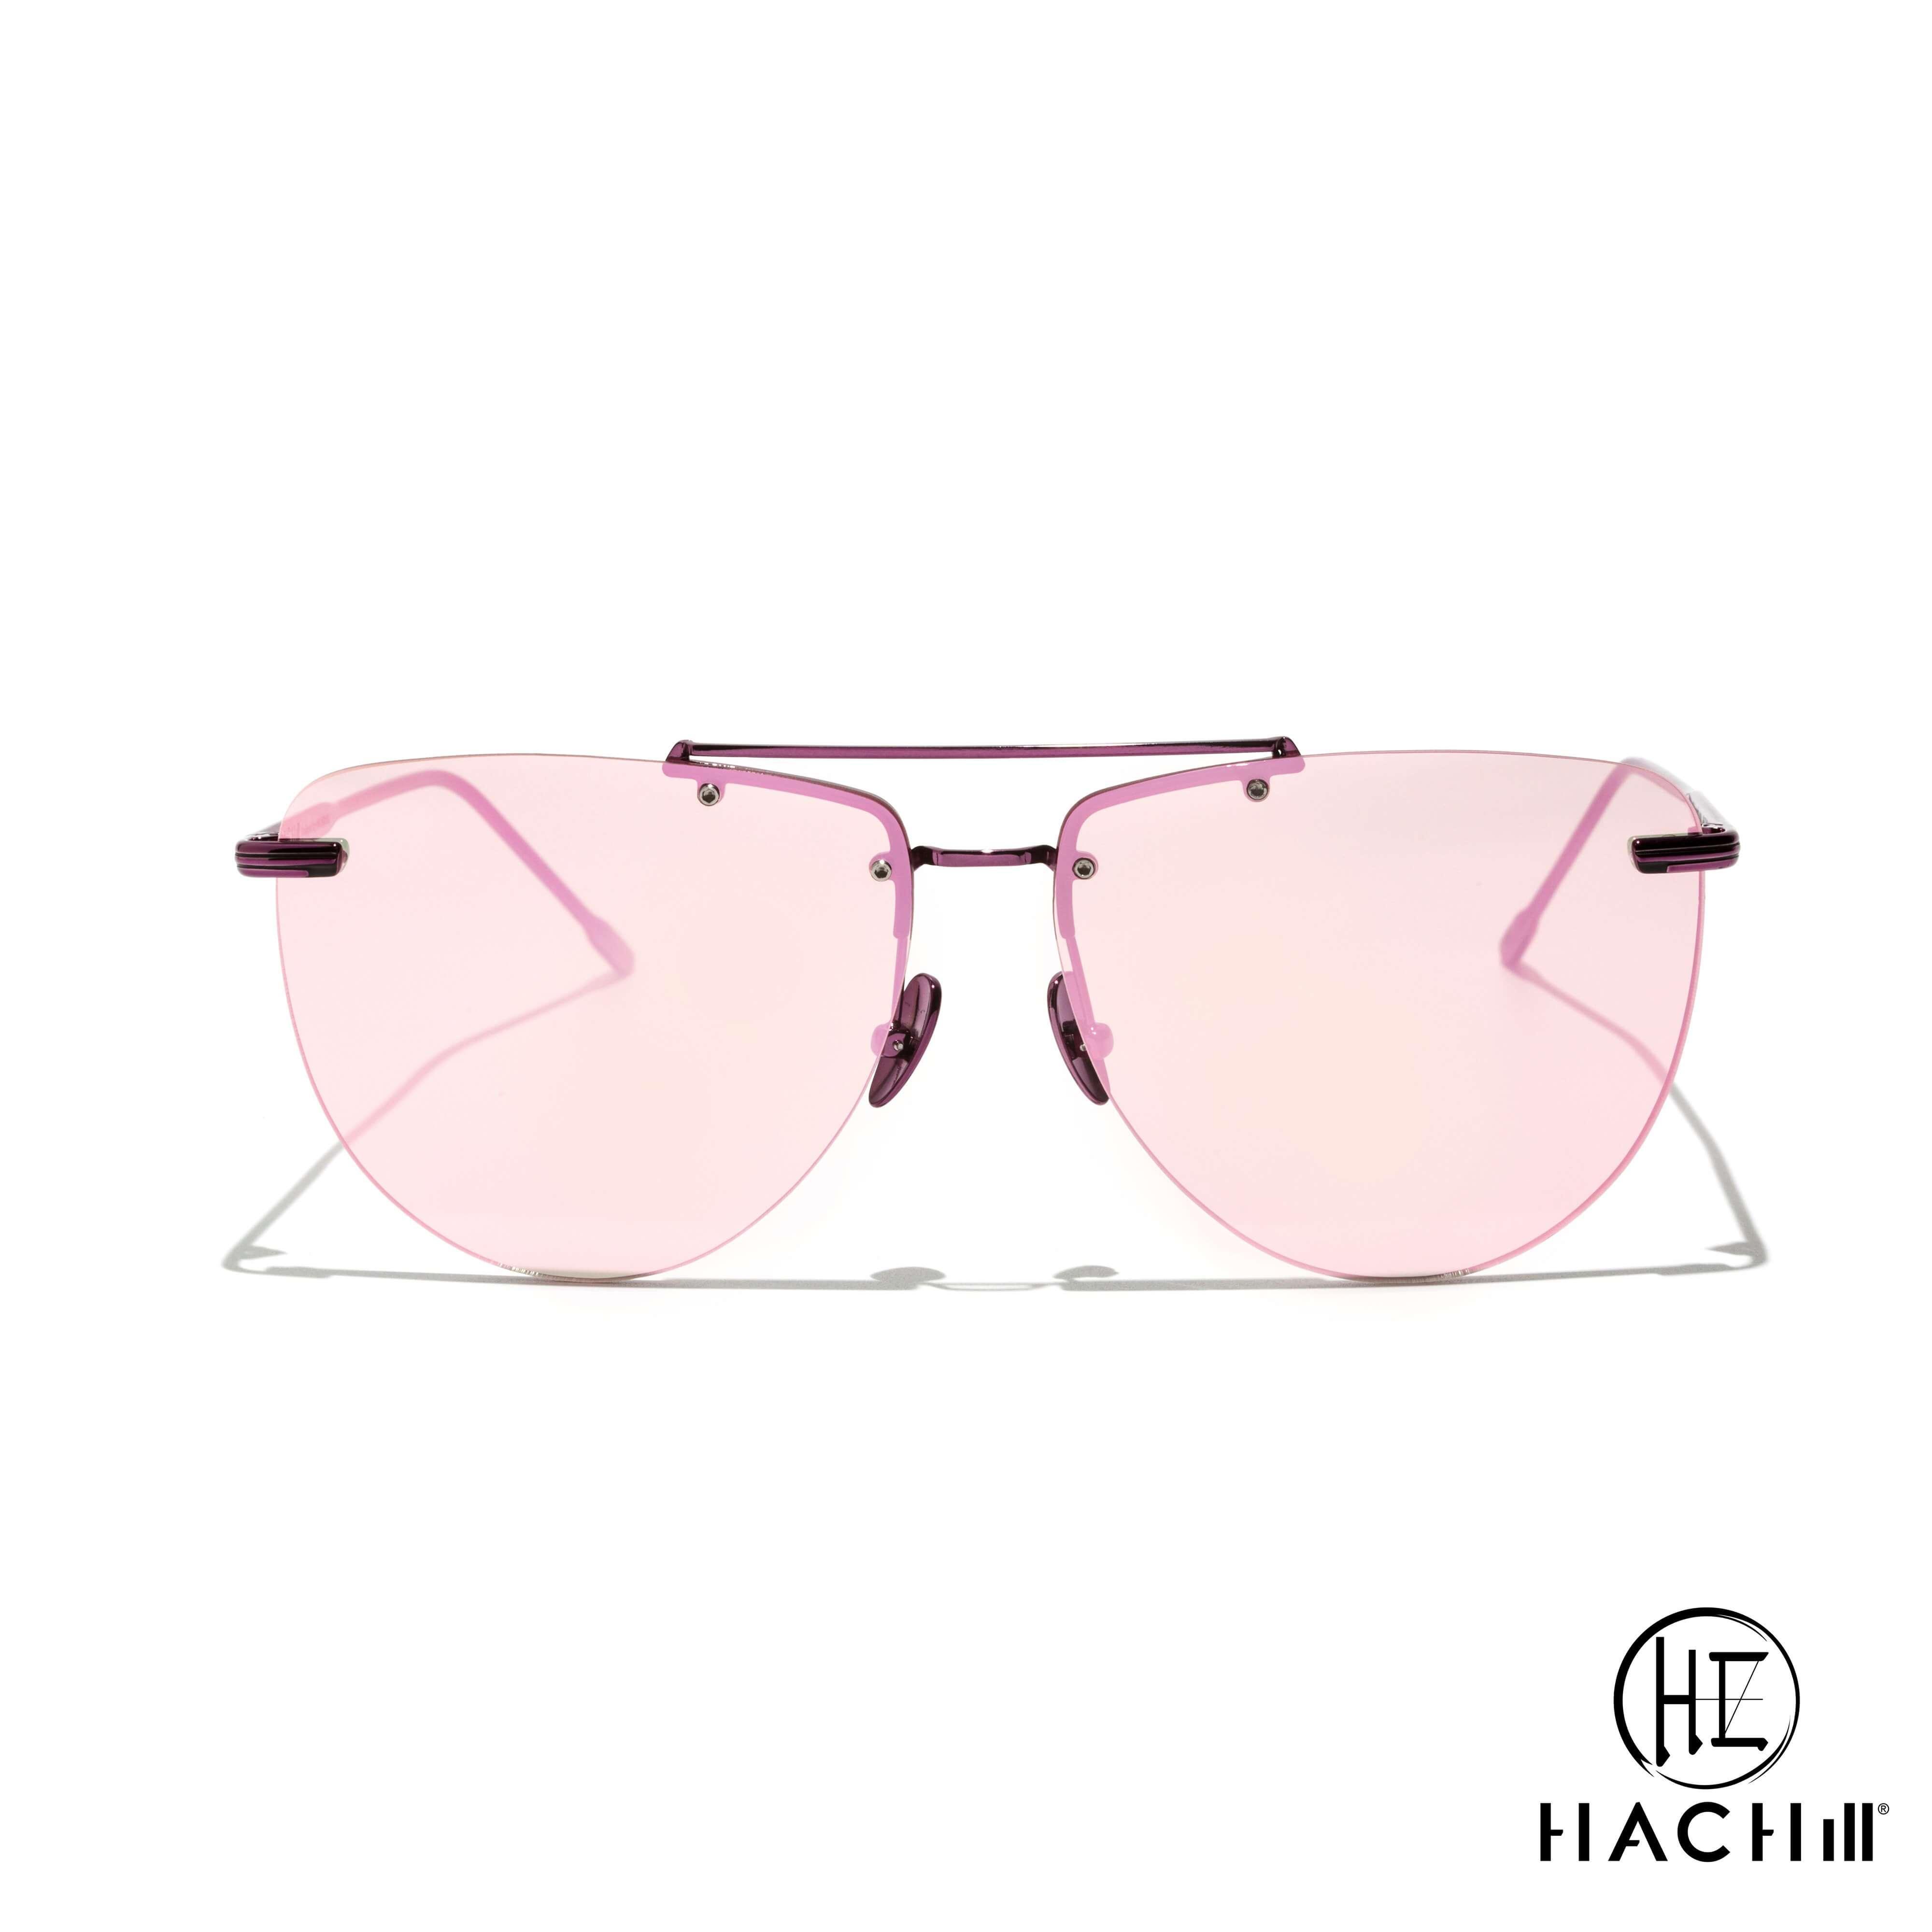 Hachill 太阳眼镜 HC8285S-C4 粉红色